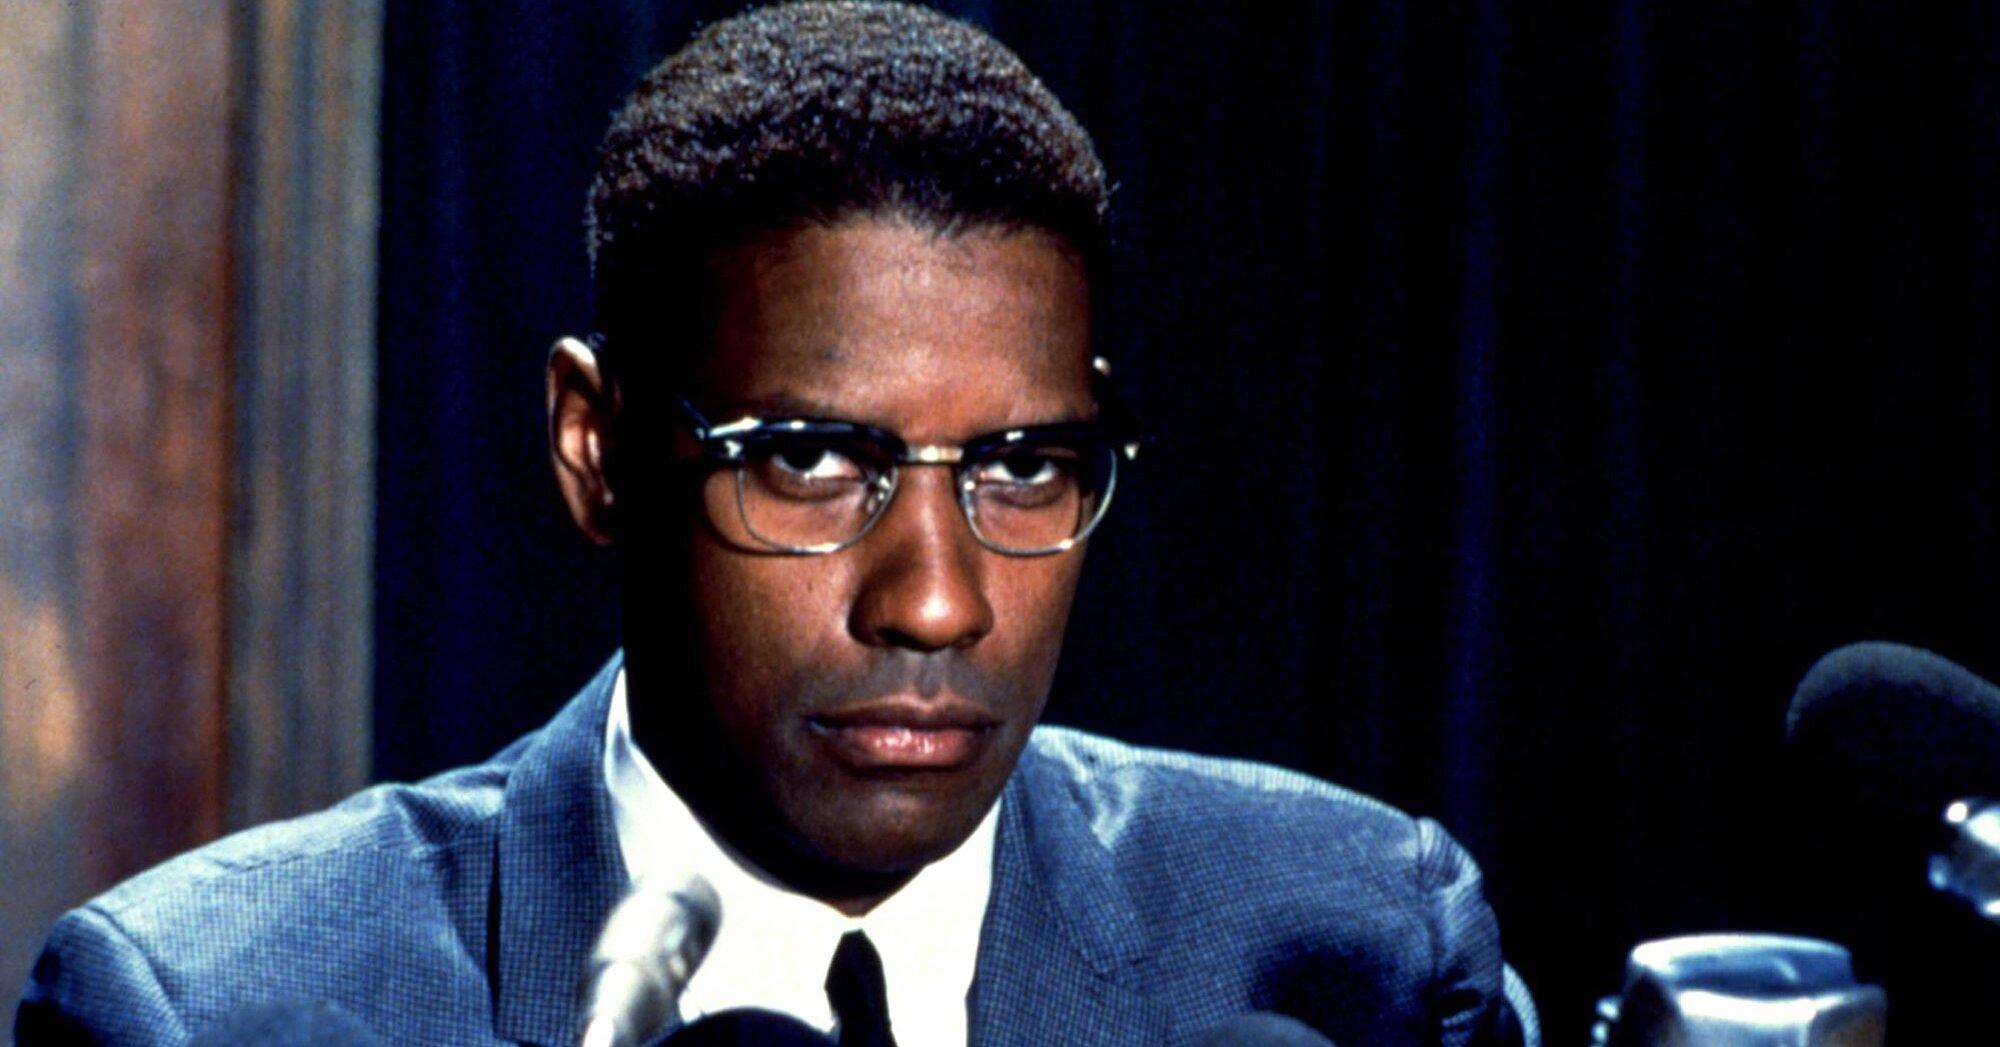 Netflix adds Black Lives Matter as new genre after 'The Help' concerns